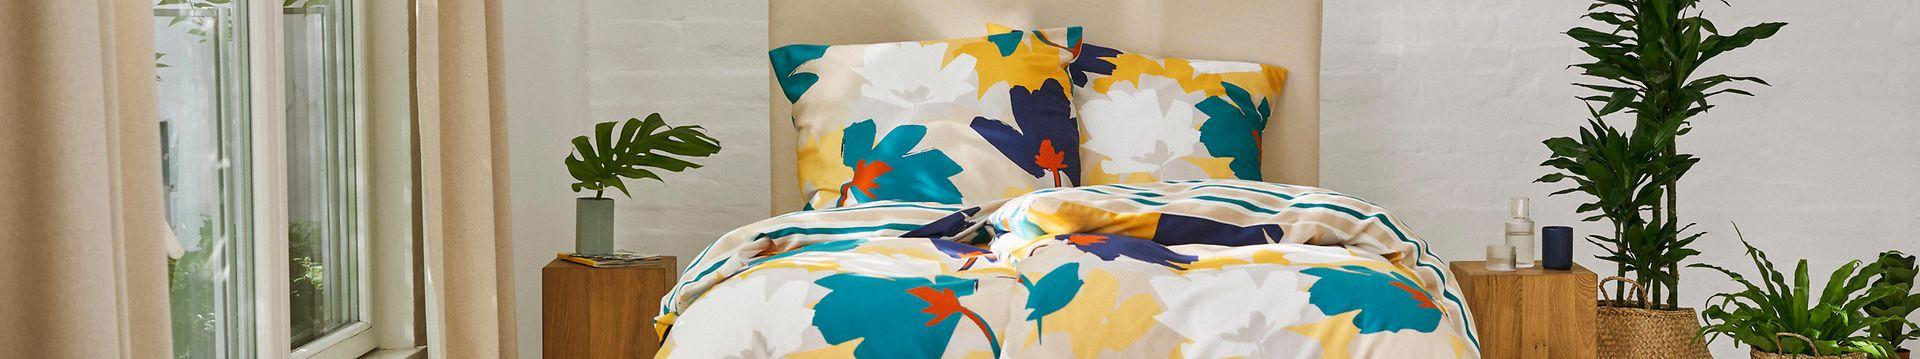 222021 - Home - Bedroom - TC banner - IMG (1)